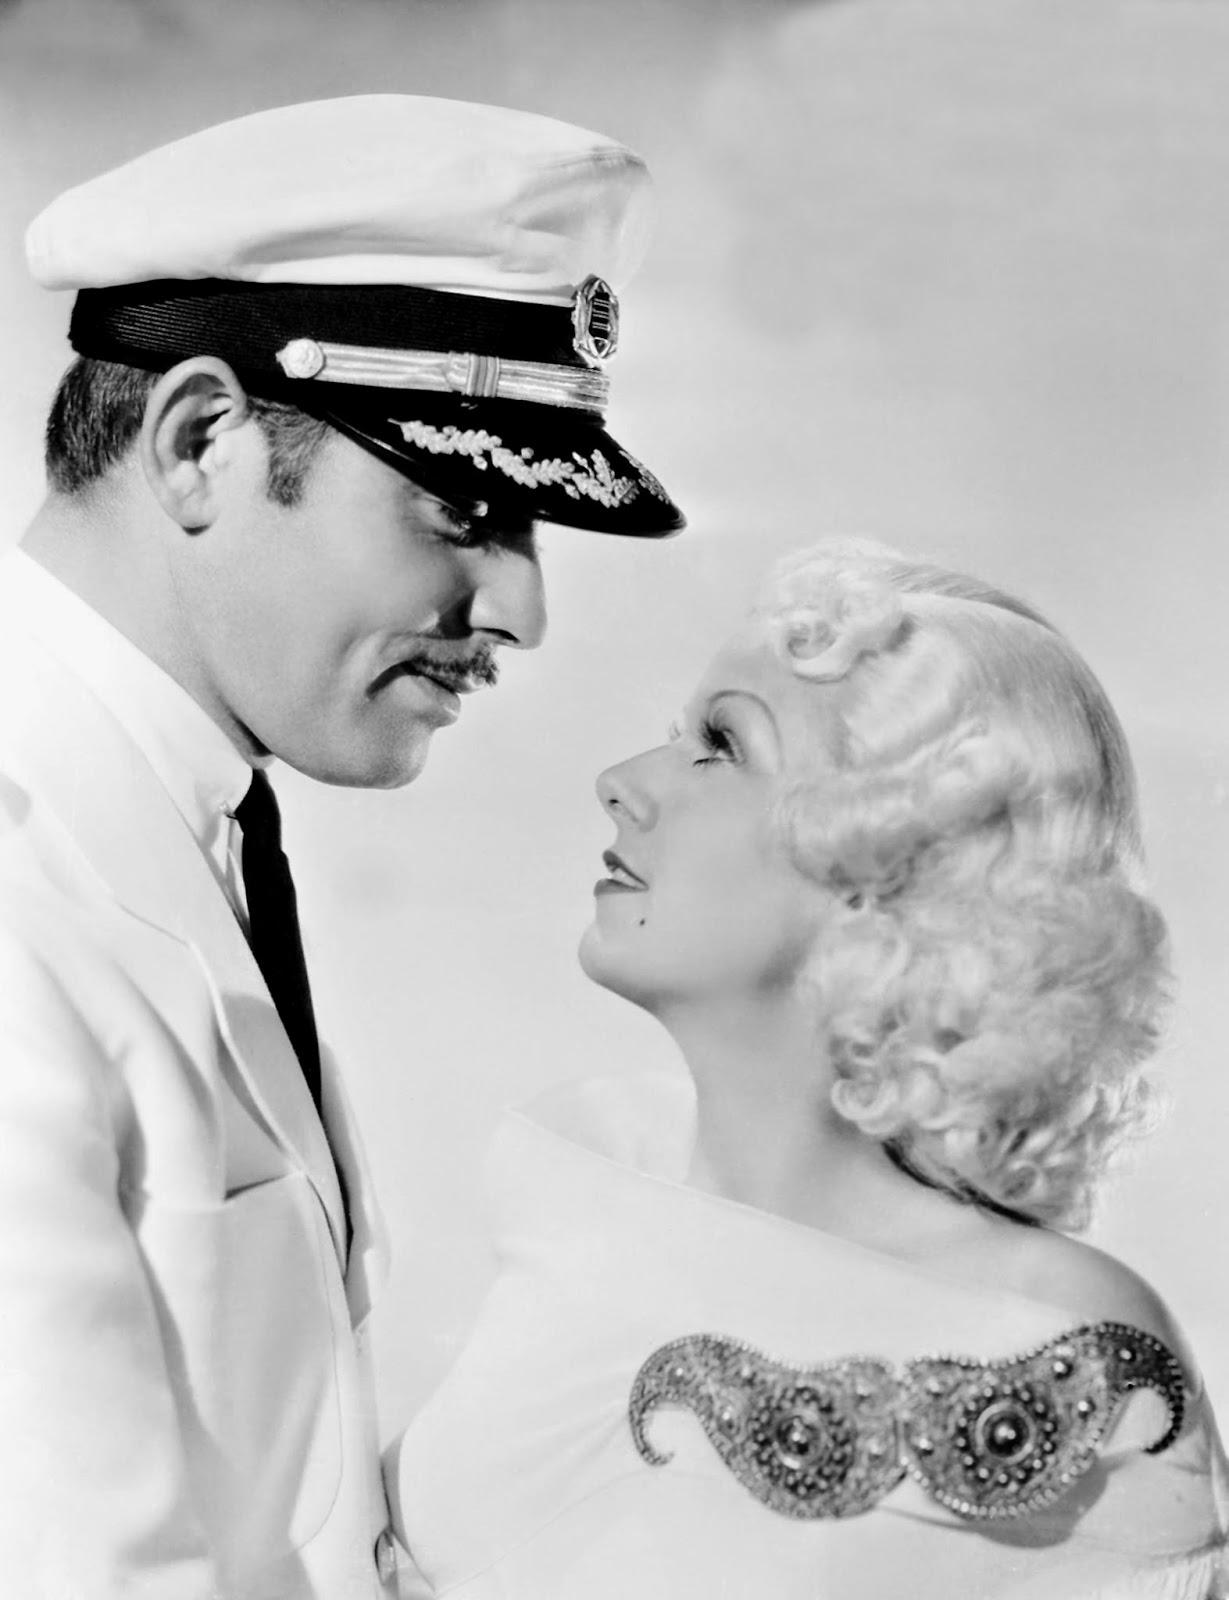 Back to Golden Days: Golden Couples: Clark Gable & Jean Harlow